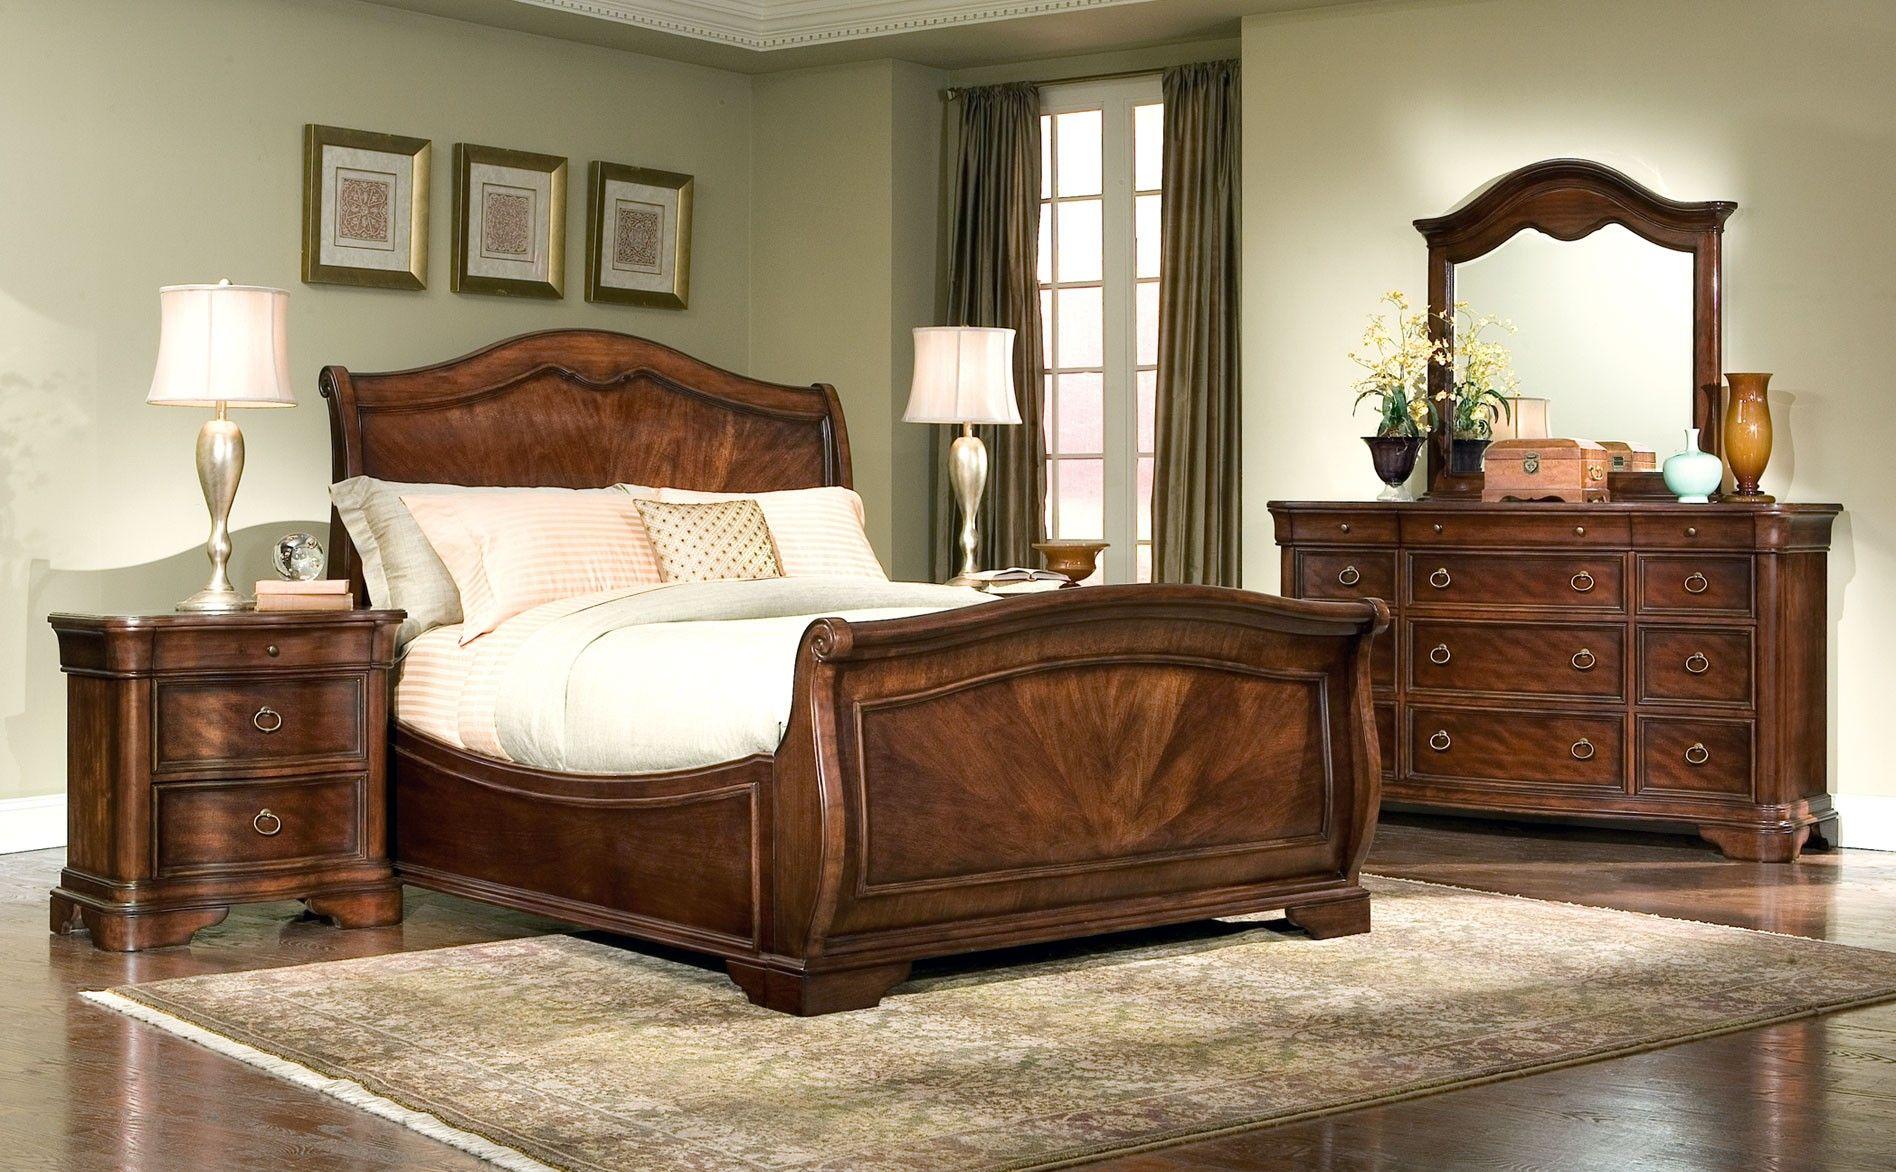 Conrad Queen Bedroom Group   Master Bedroom   Raleigh Furniture   Home Comfort Furniture